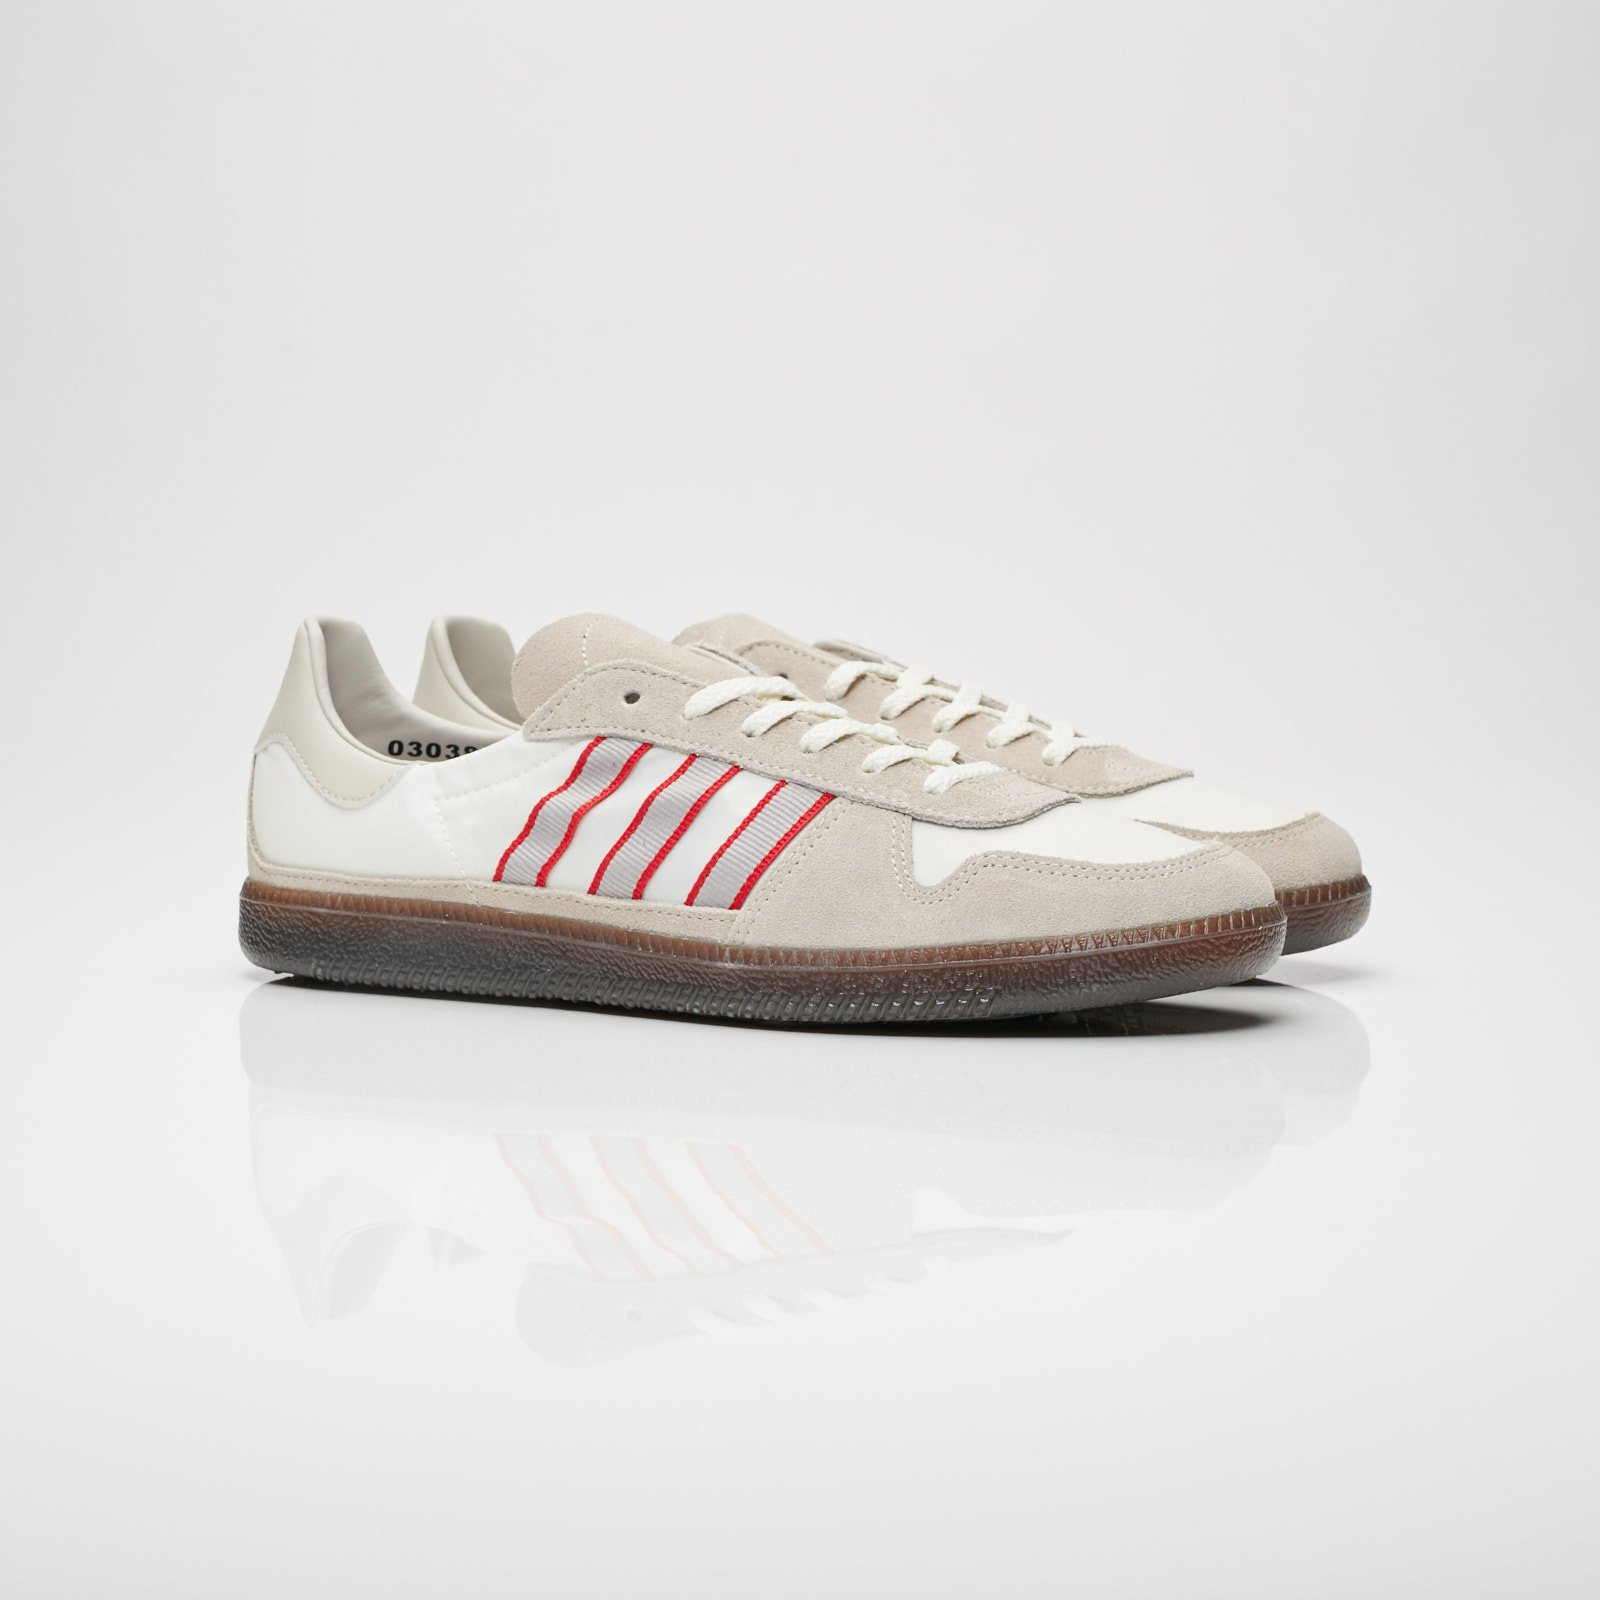 adidas Hulton - Da8756 - Sneakersnstuff